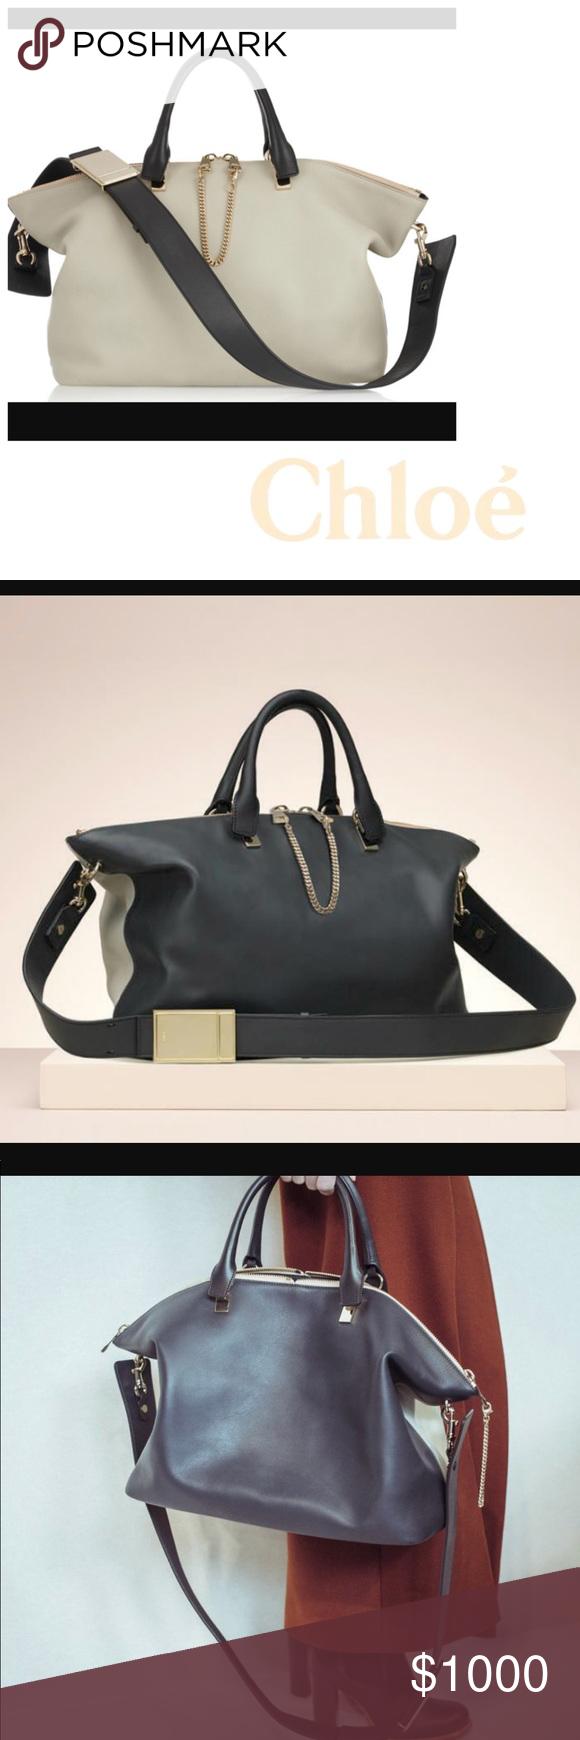 Large Chloe Bailey 2 Way Shoulder Bag Authentic